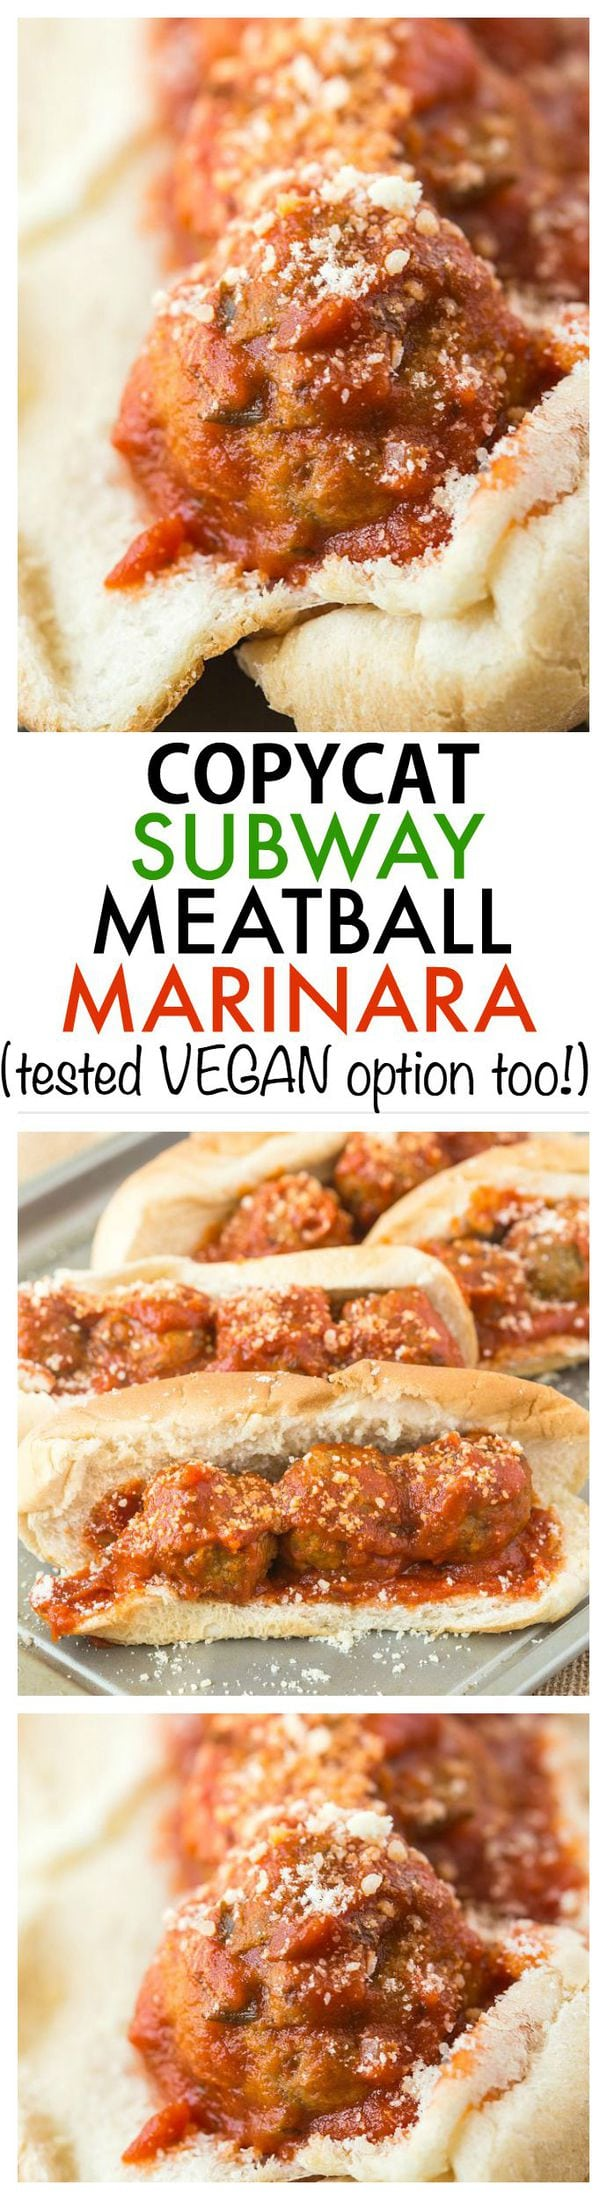 recipe: meatball marinara subway recipe [12]